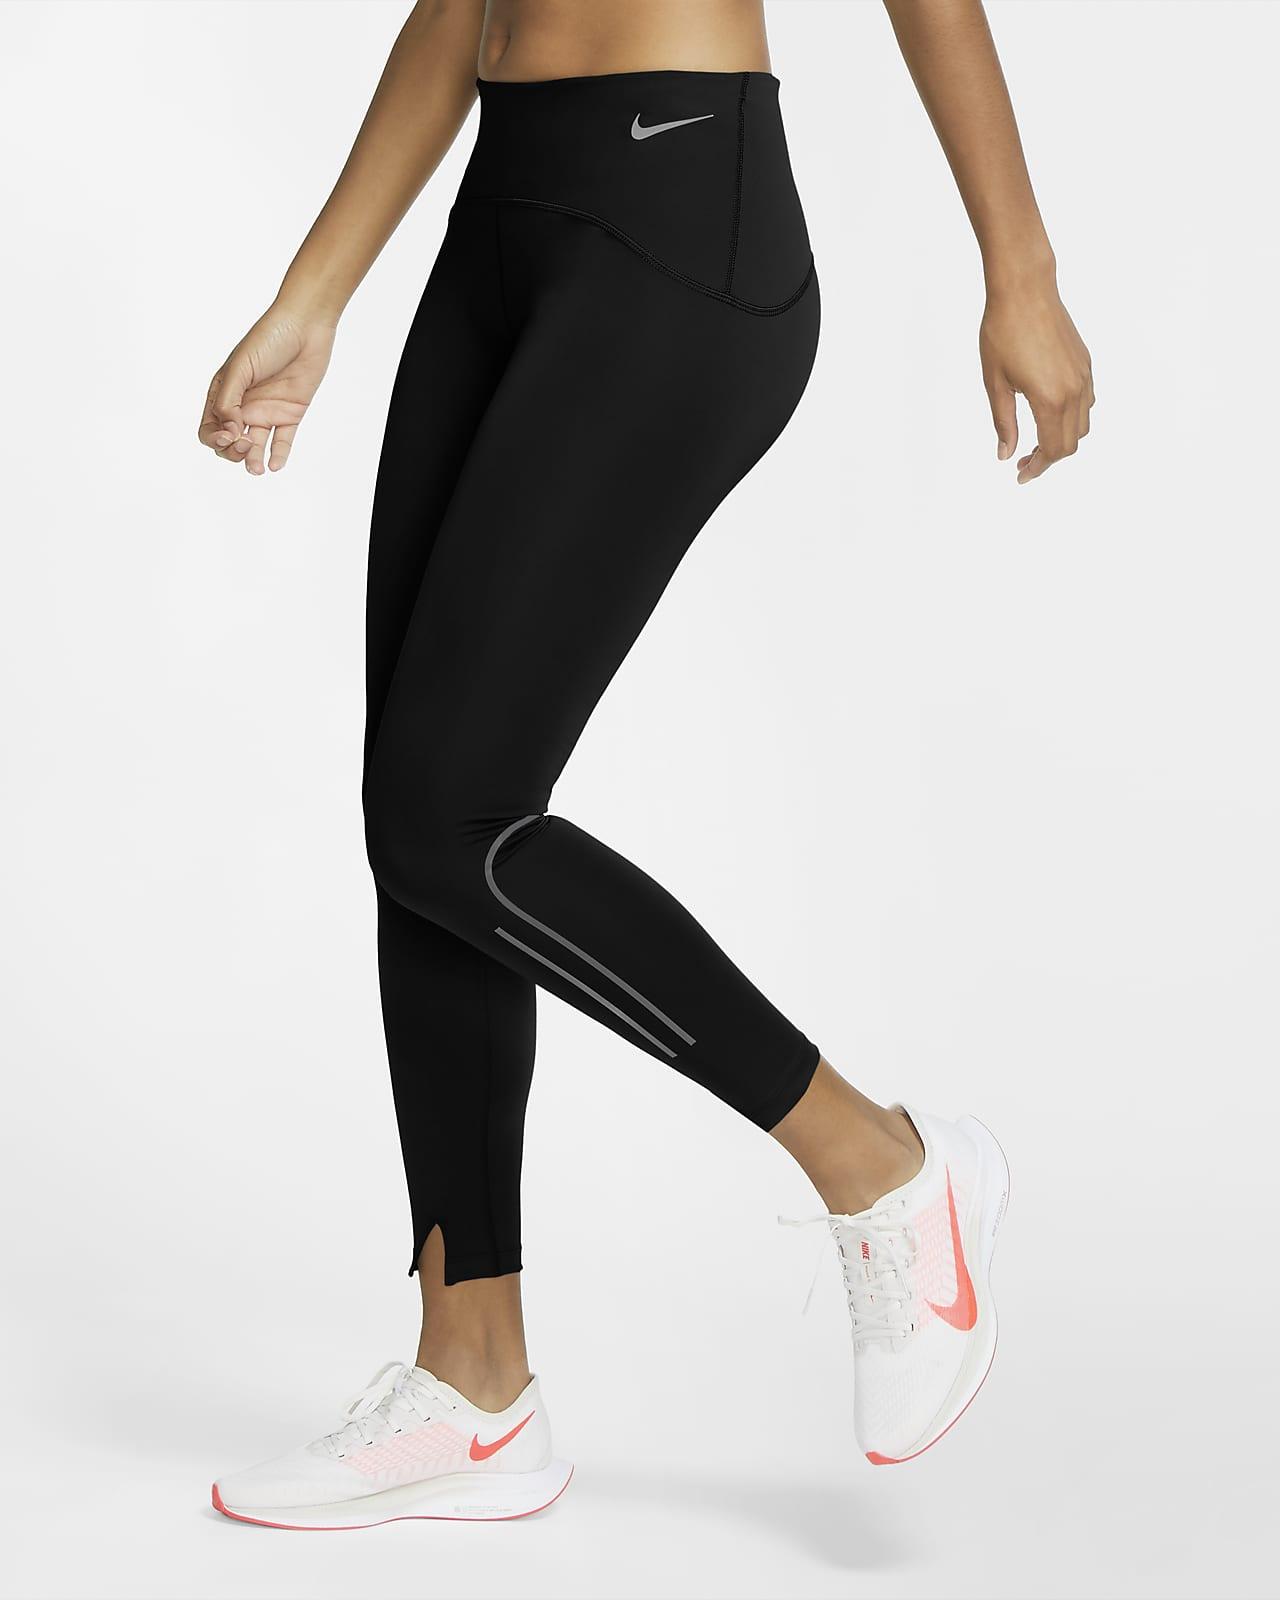 Tights de running mate com comprimento a 7/8 Nike Speed para mulher